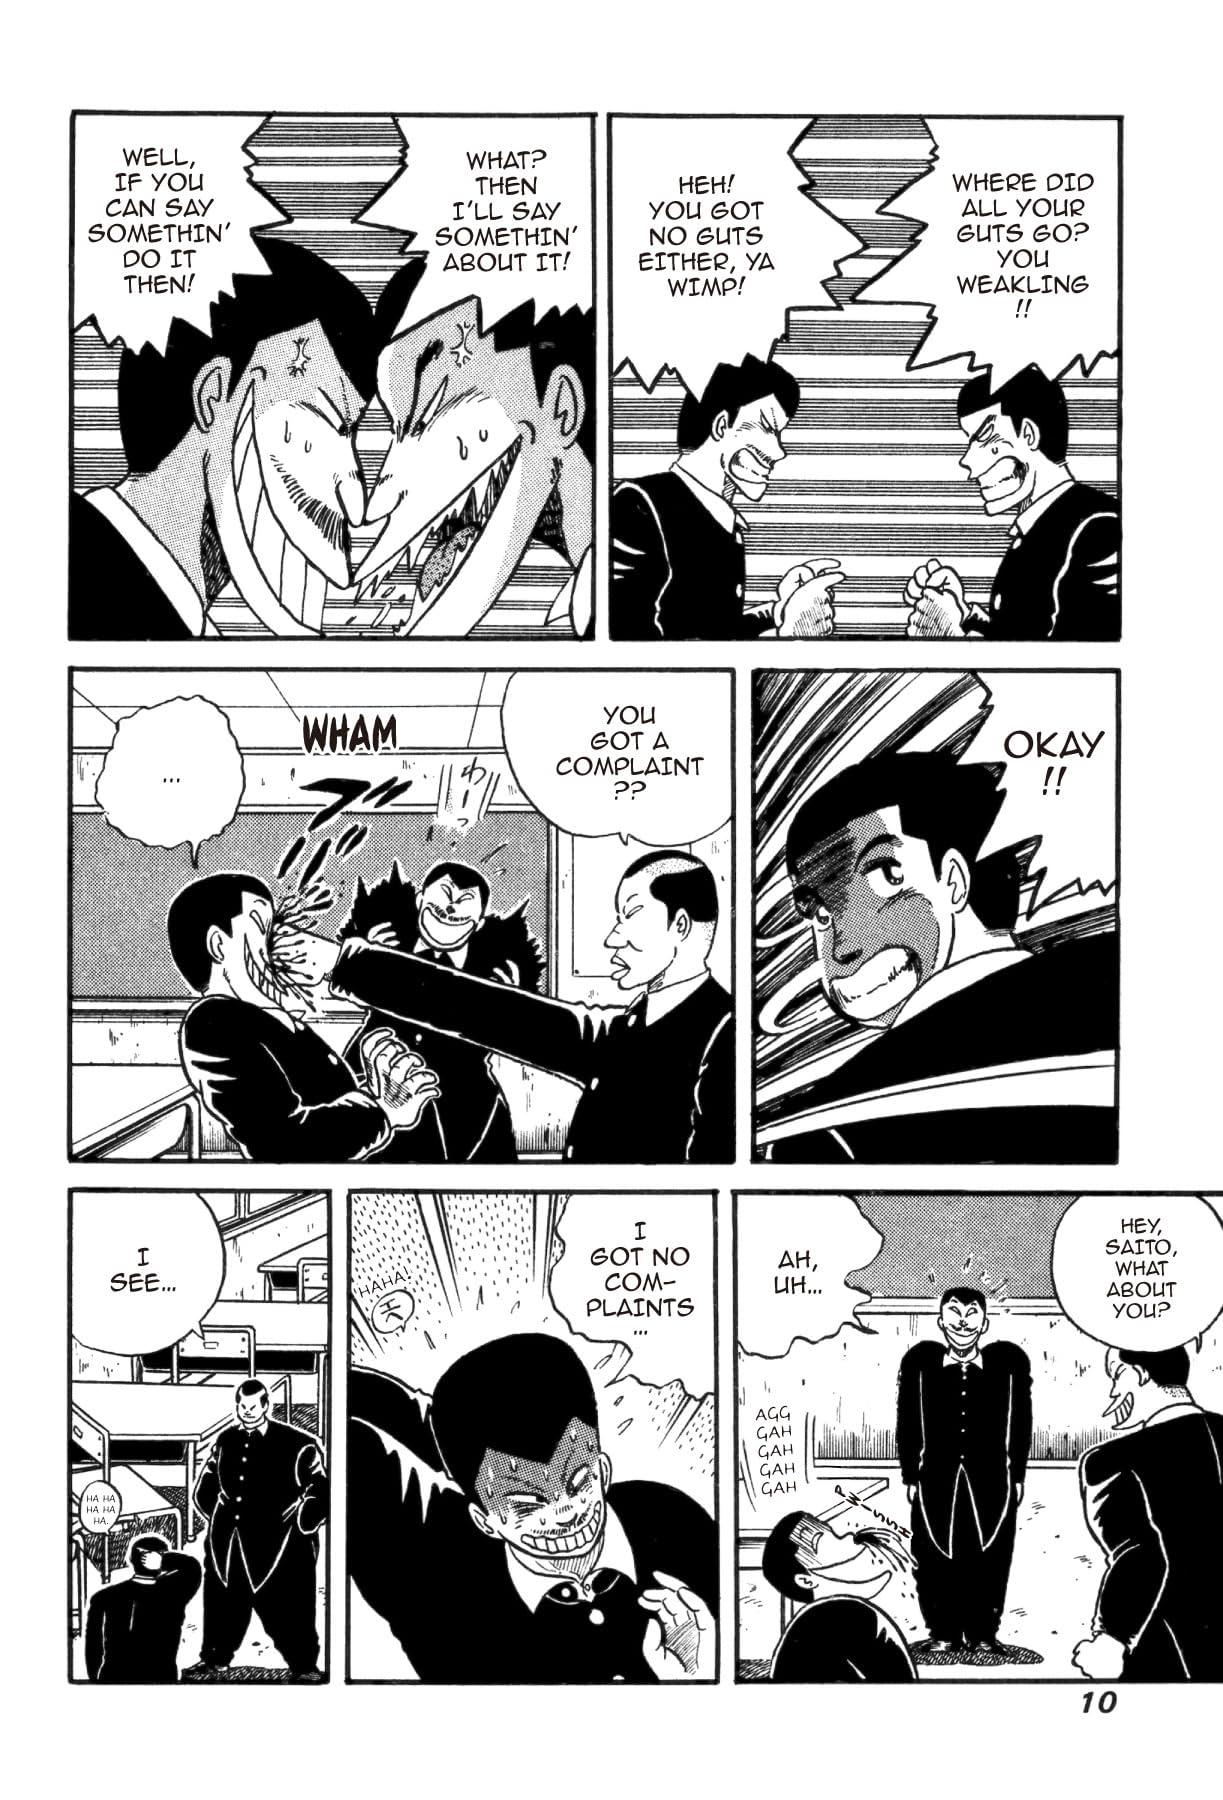 Osu! Karate Club #15